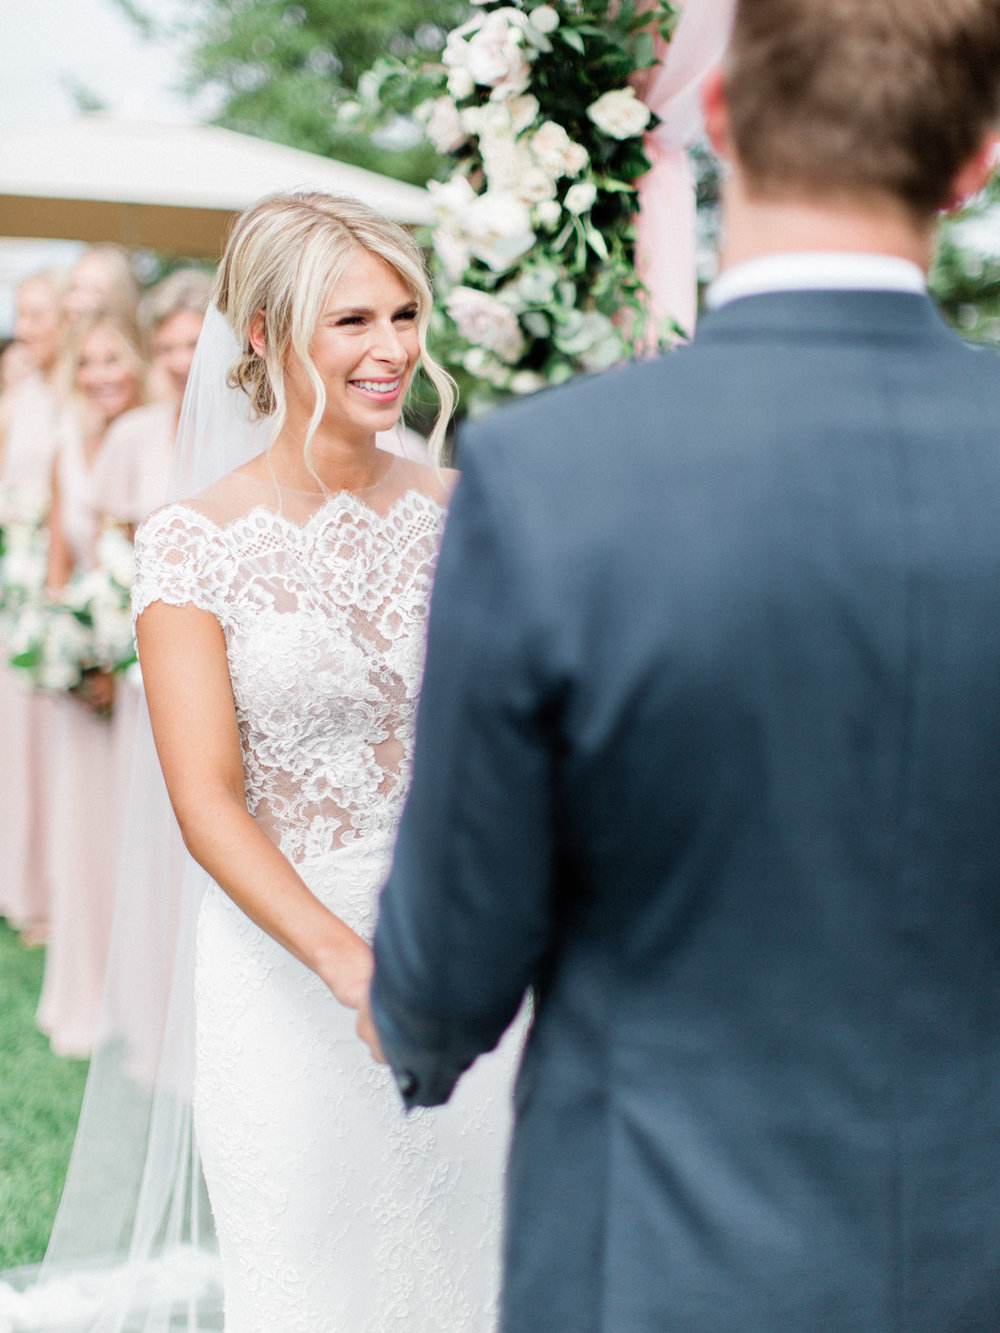 Toronto-Muskoka-wedding-photographer-summery-fun-documentary-the-marriott-rosseau83.jpg